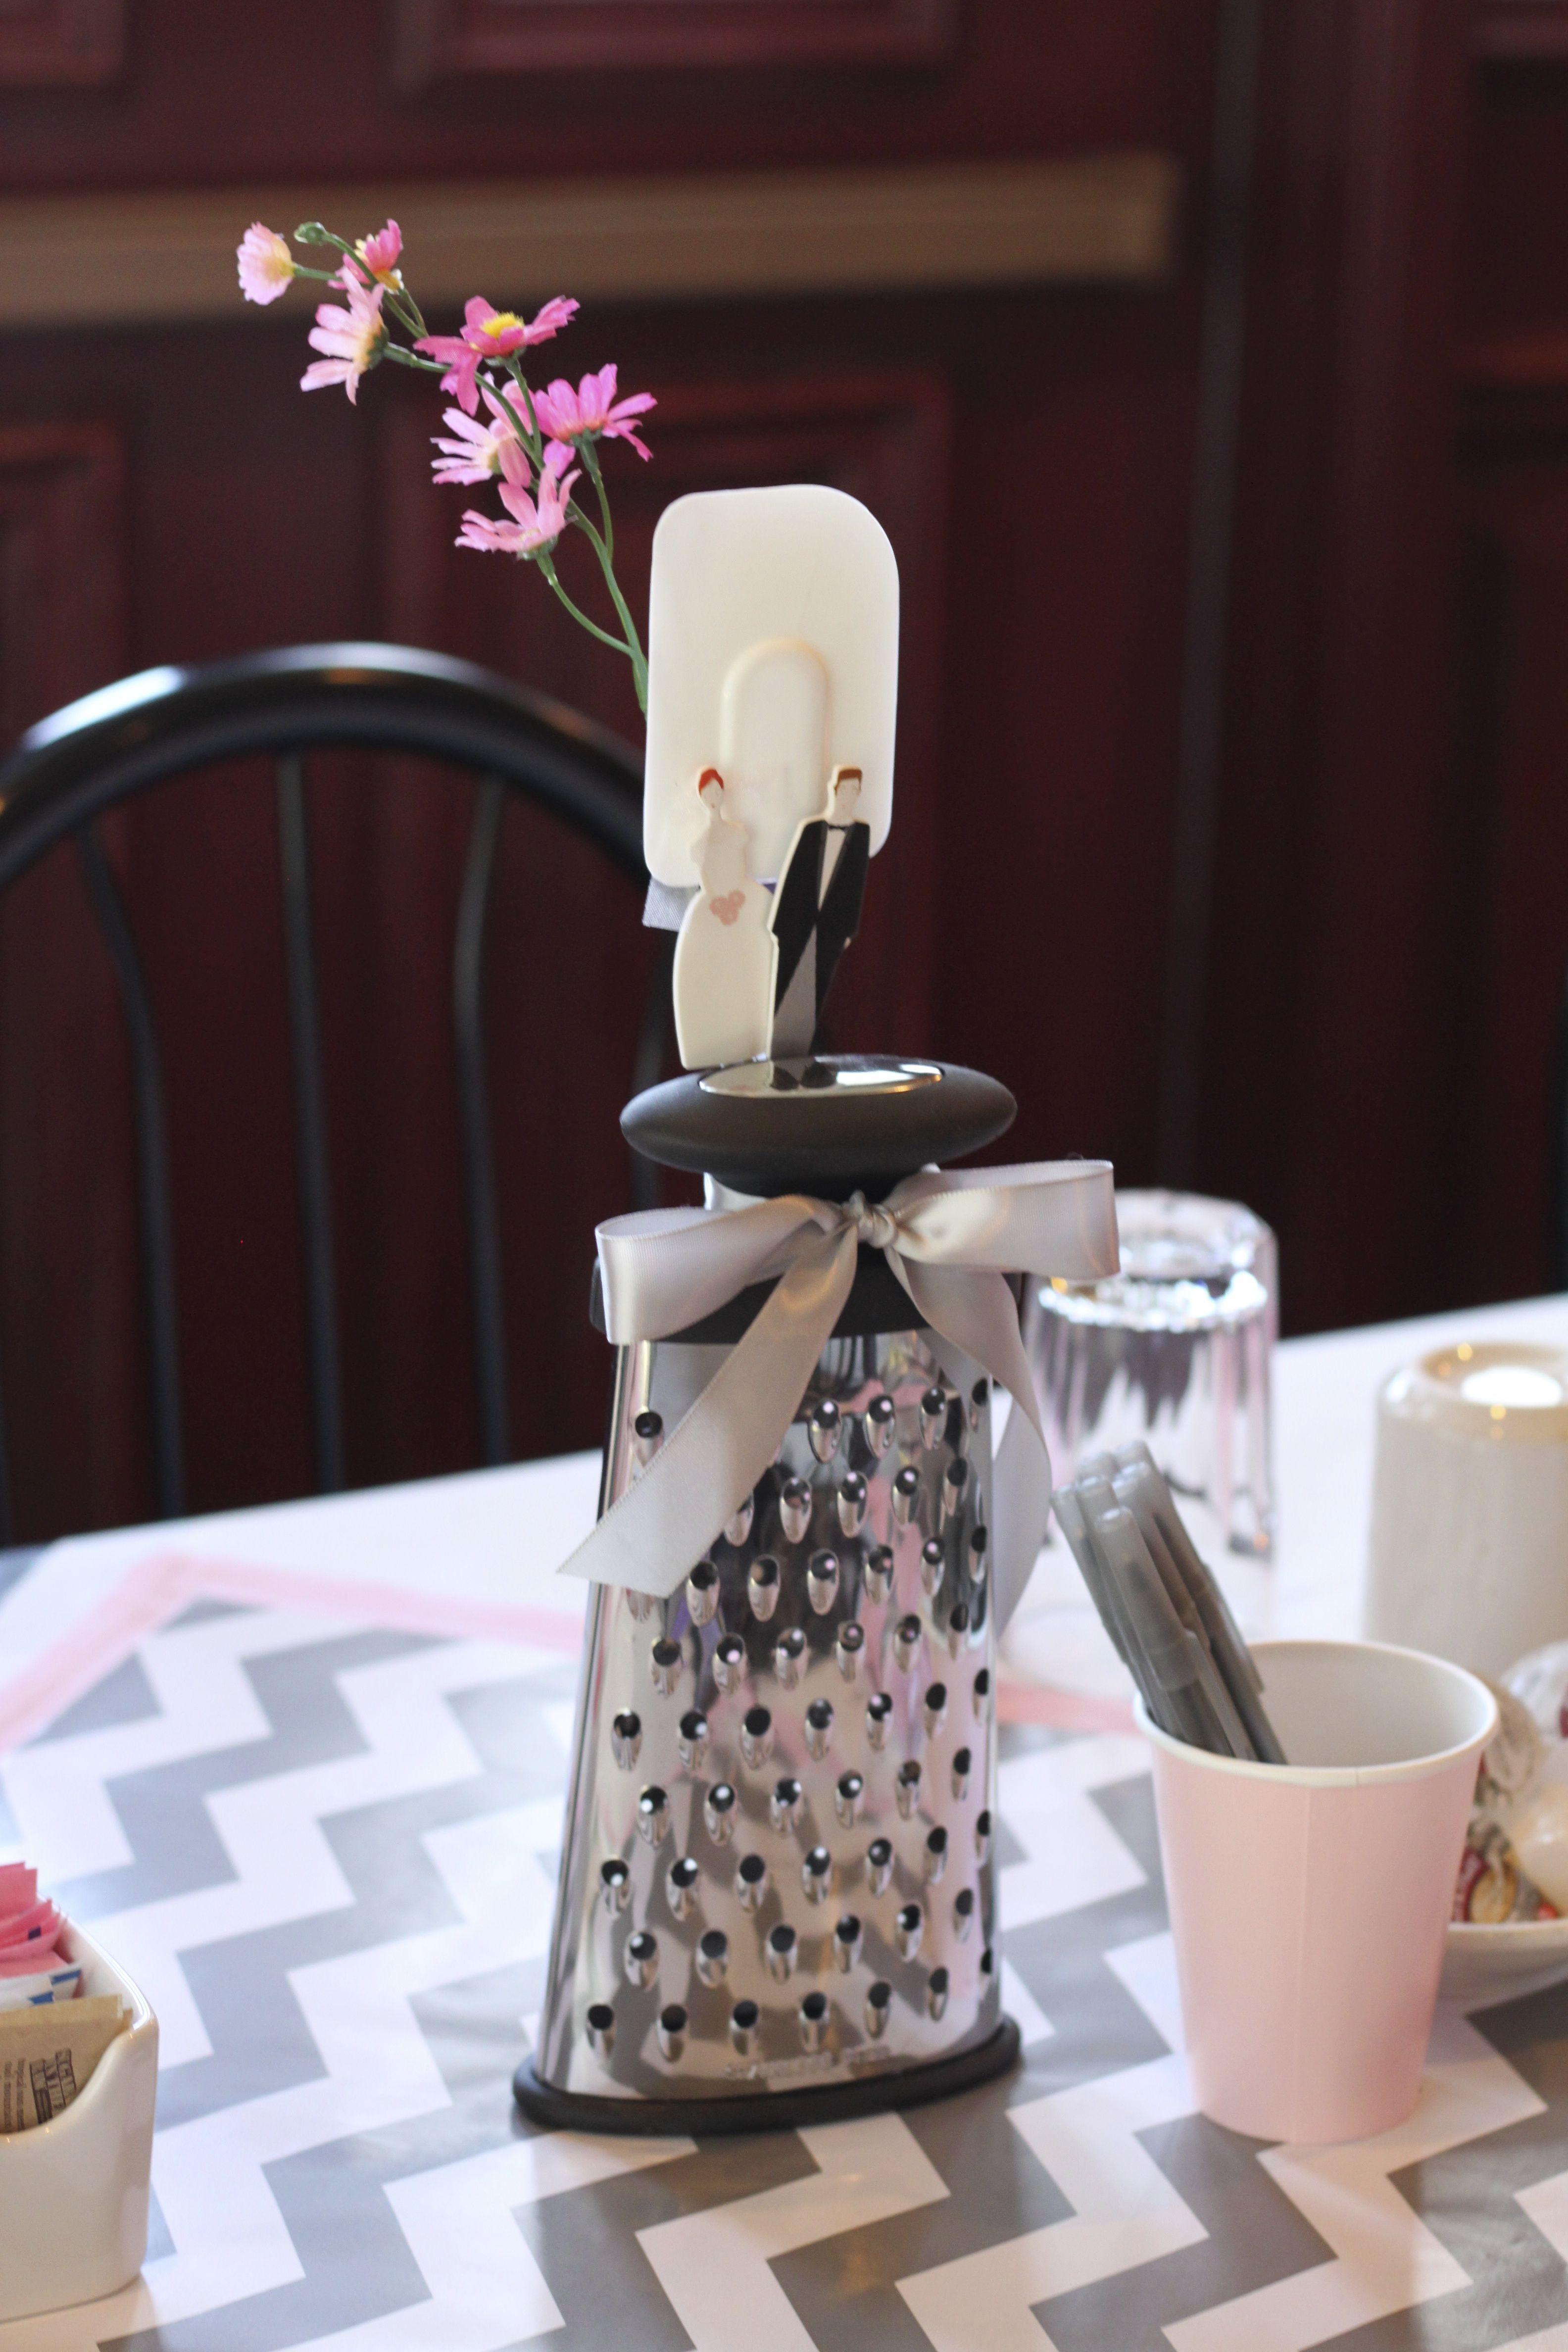 bridal shower centerpiece cooking theme grater photo wedding centerpieces wedding shower decorations